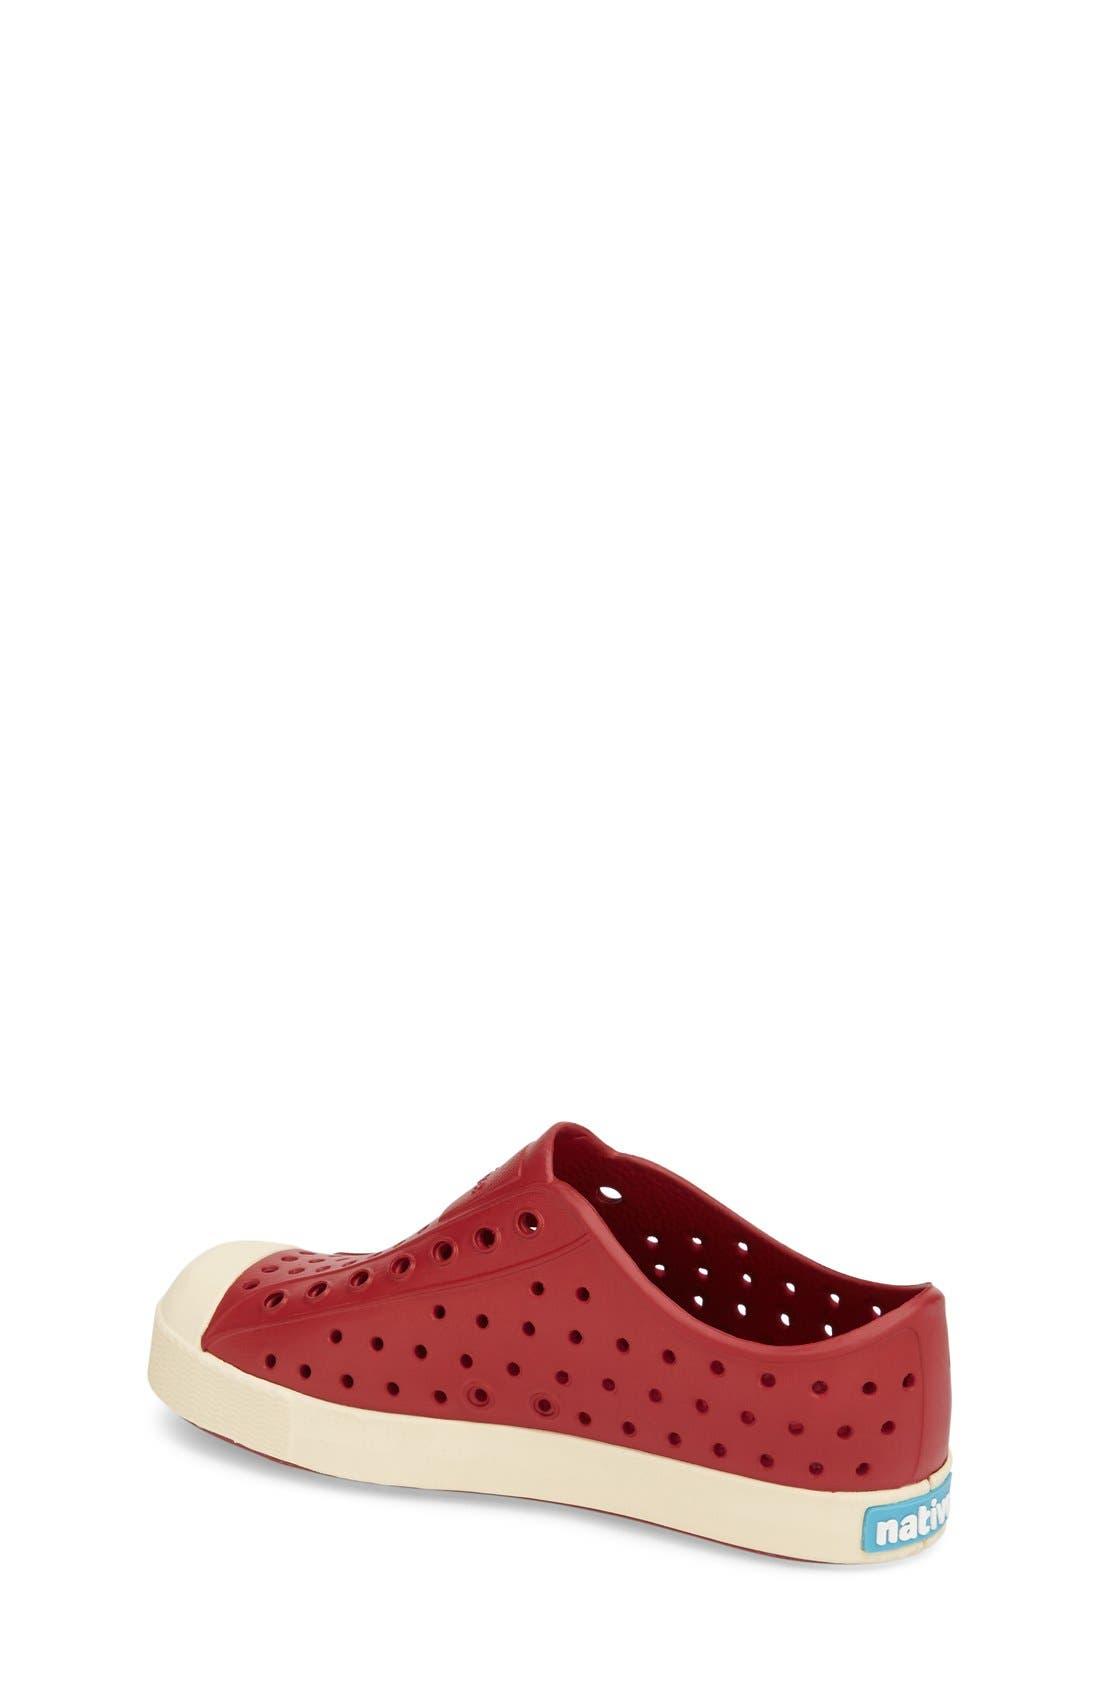 'Jefferson' Water Friendly Slip-On Sneaker,                             Alternate thumbnail 109, color,